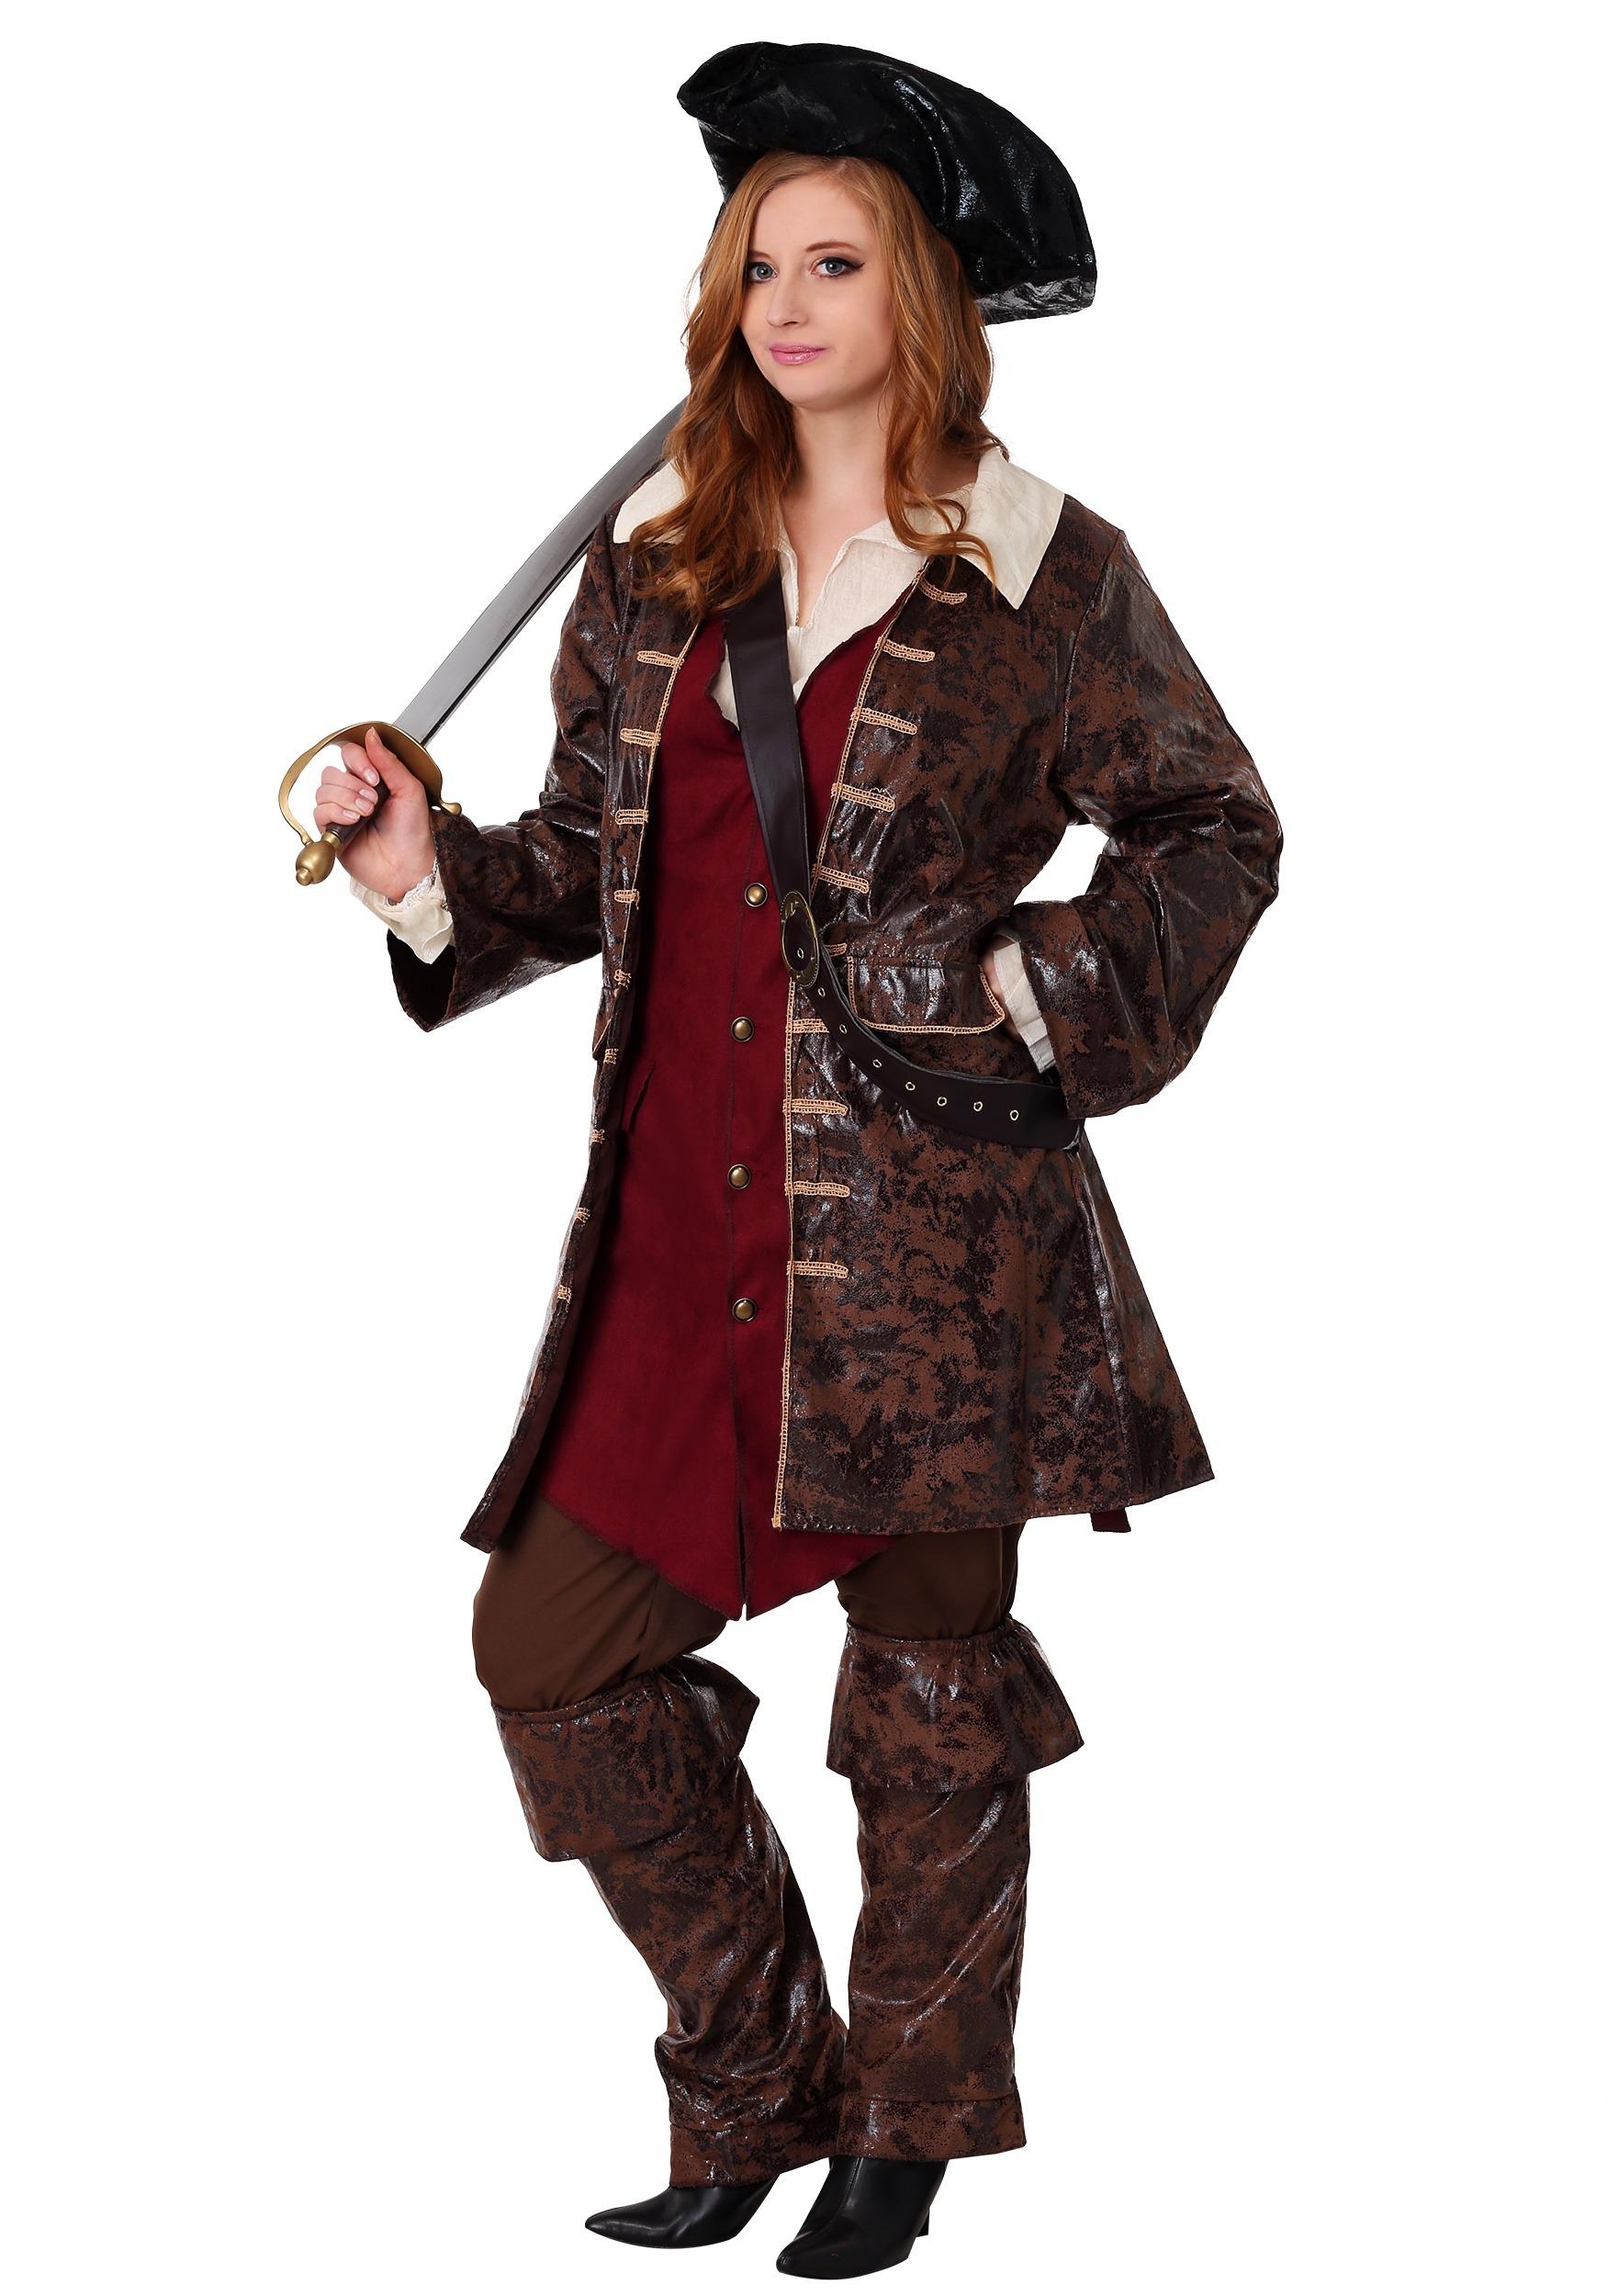 ab036788 Women's Pirate Costumes - Female Pirate Costume Halloween